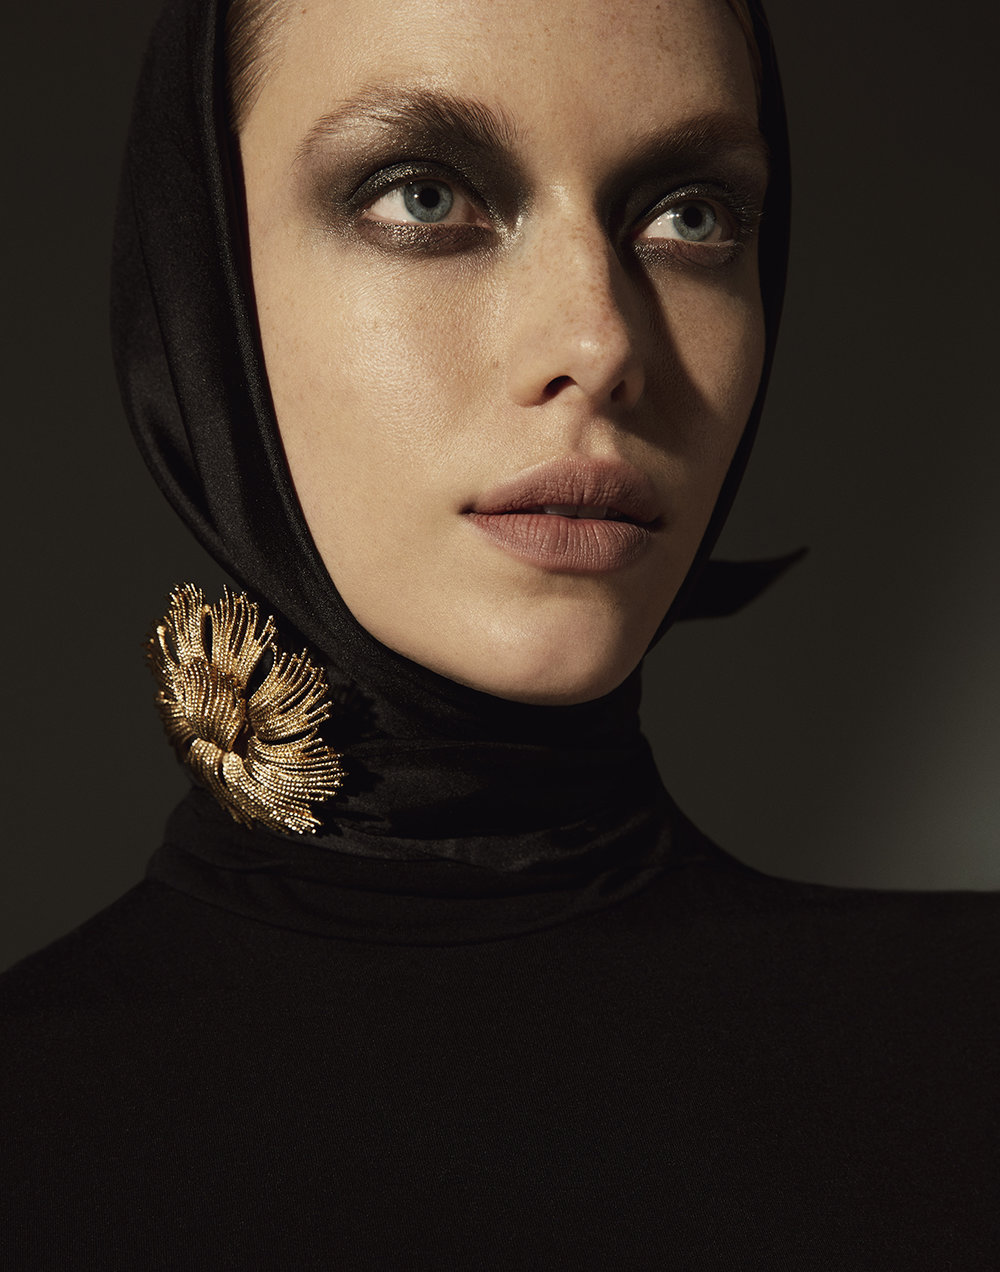 180312_Vouge_Arabia0913_V1A_QCweb.jpg